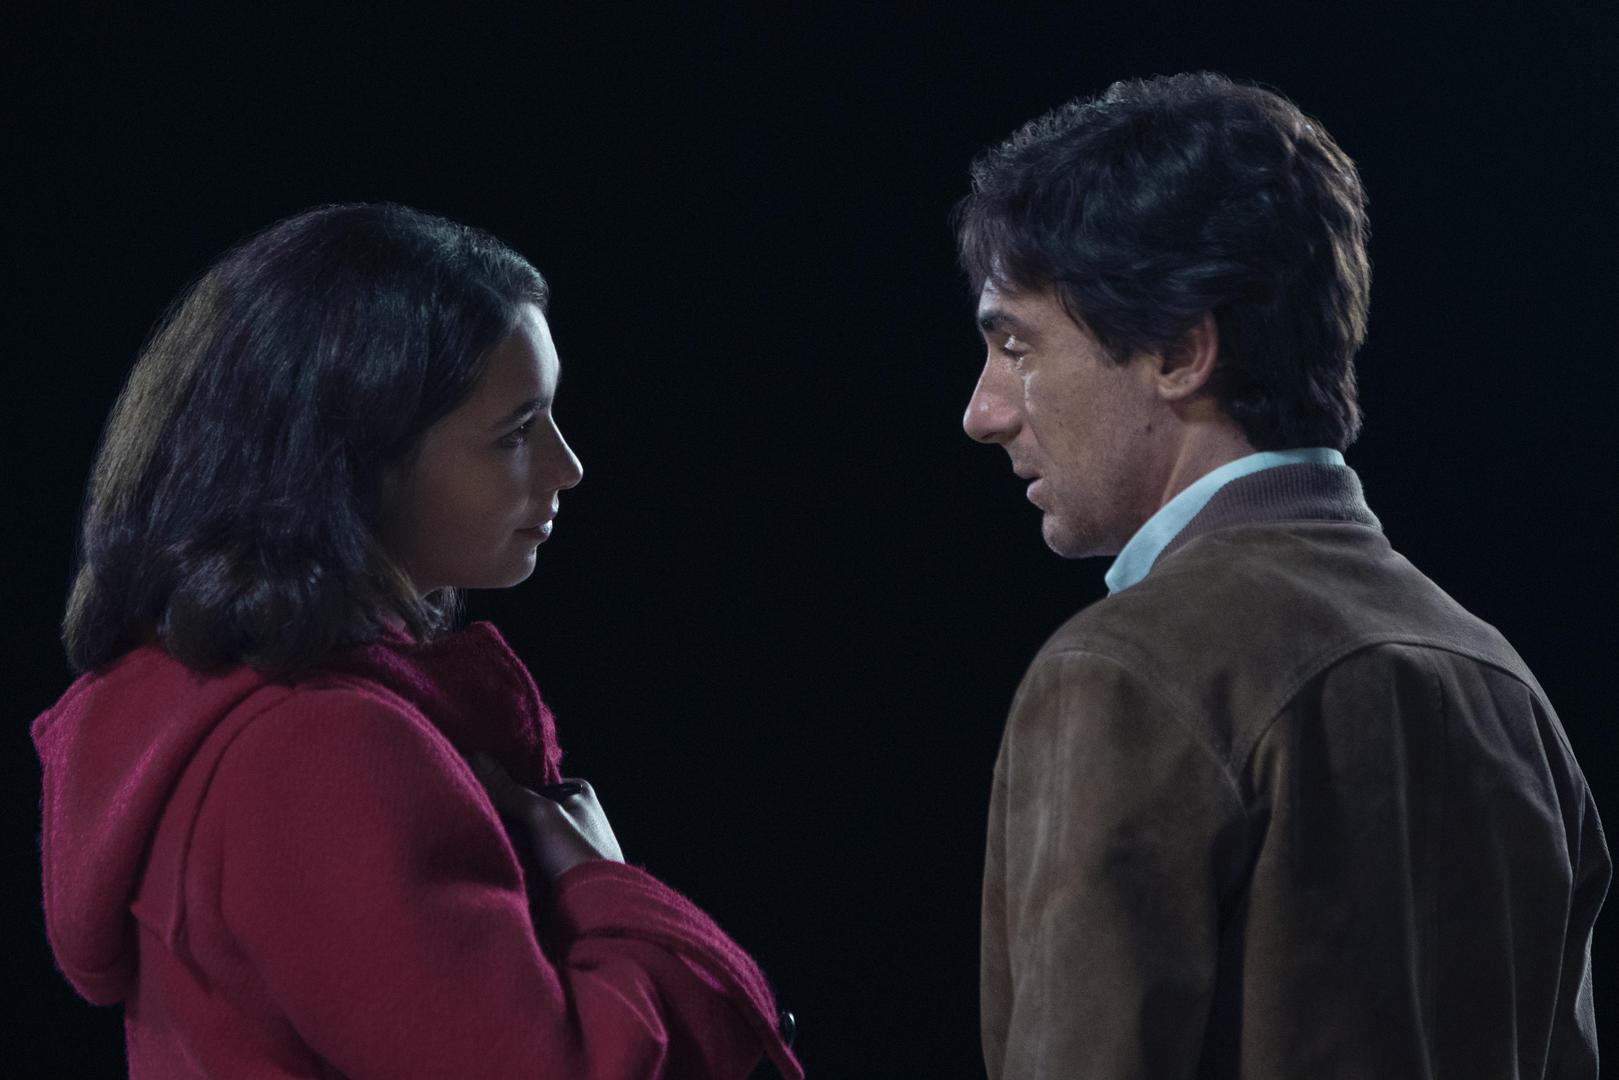 Elio Germano e Matilda De Angelis